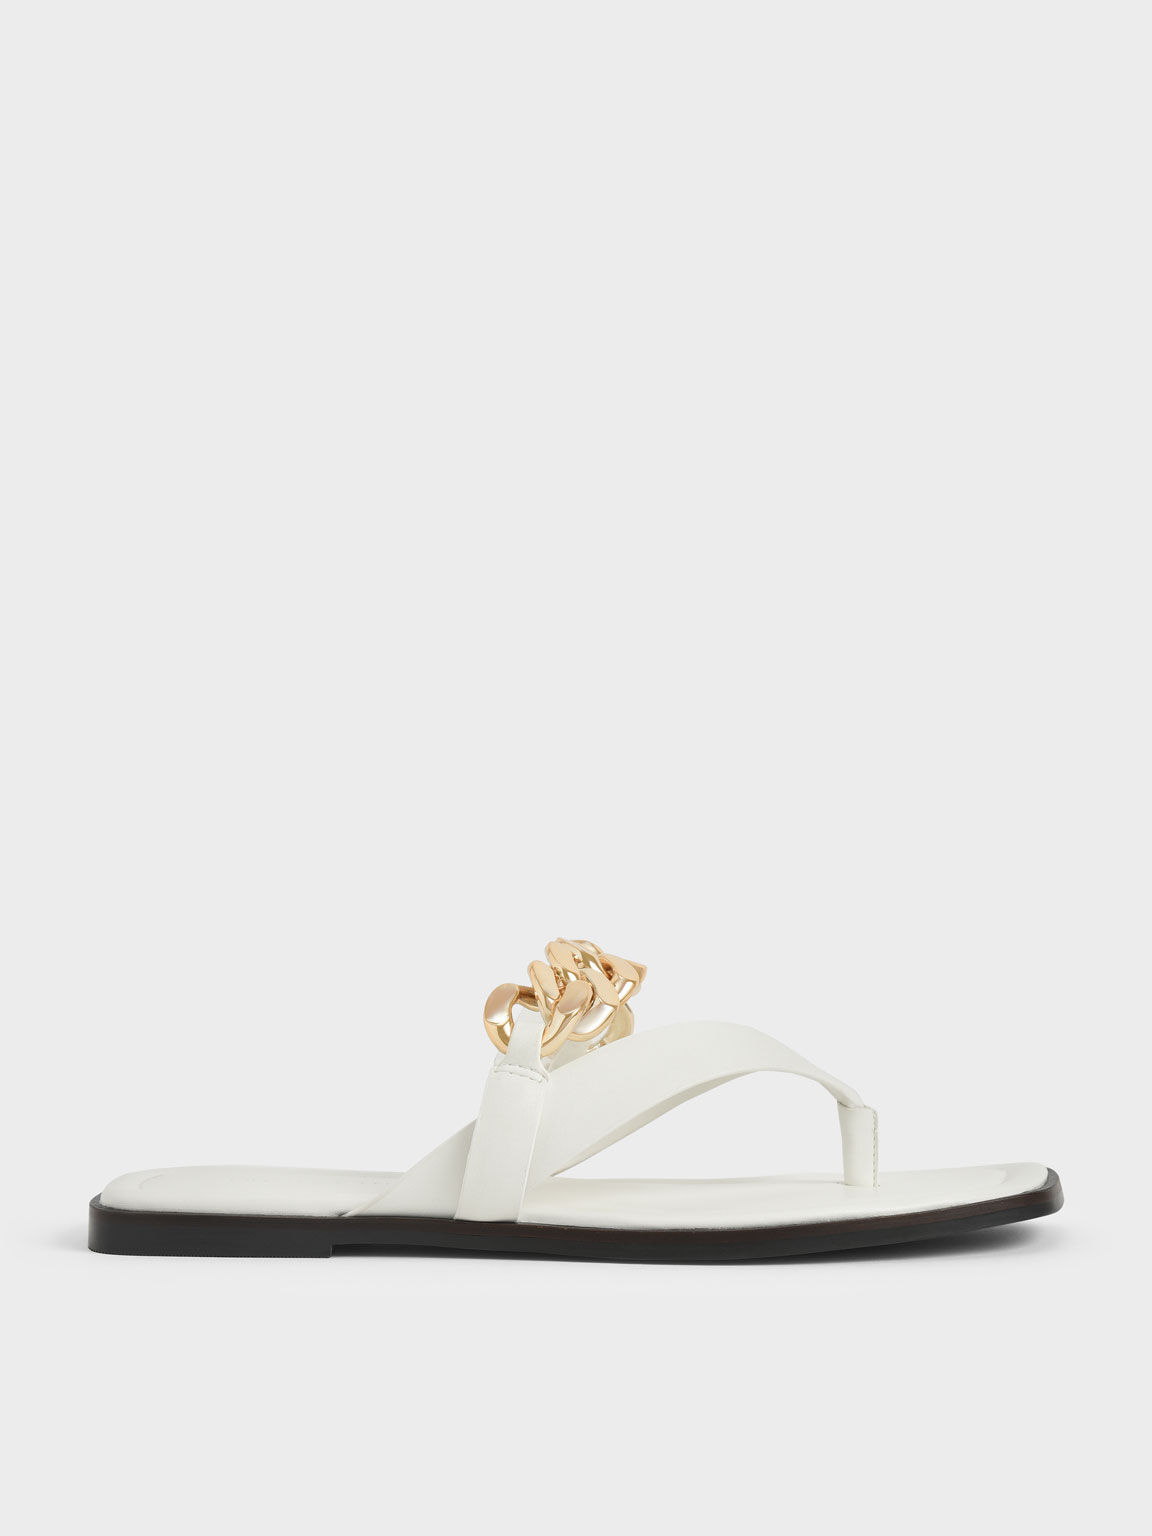 Sandal Chain Strap Thong, White, hi-res